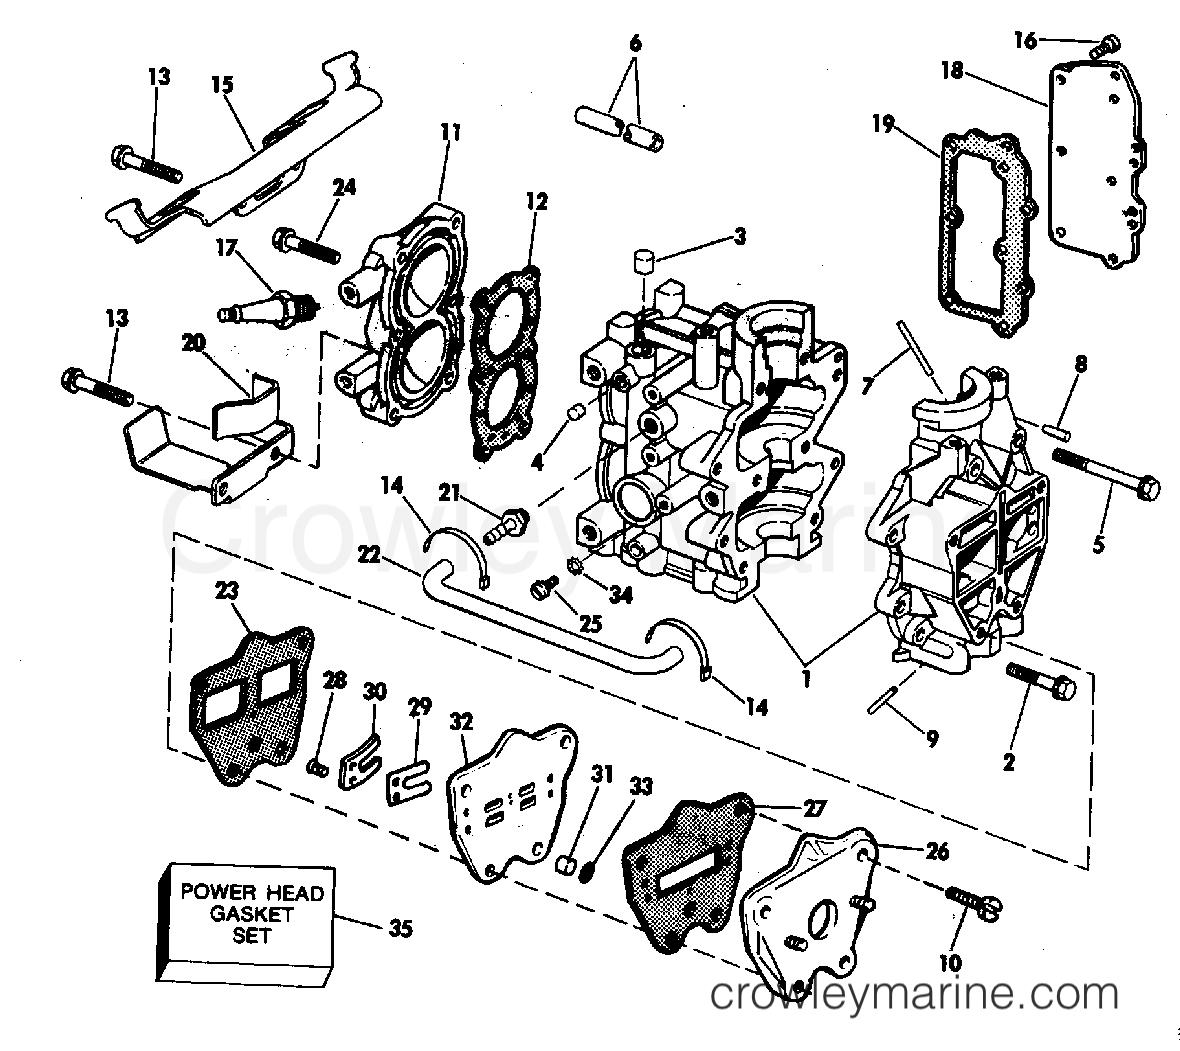 Cylinder Amp Crankcase 4 5 Amp Intake Manifold